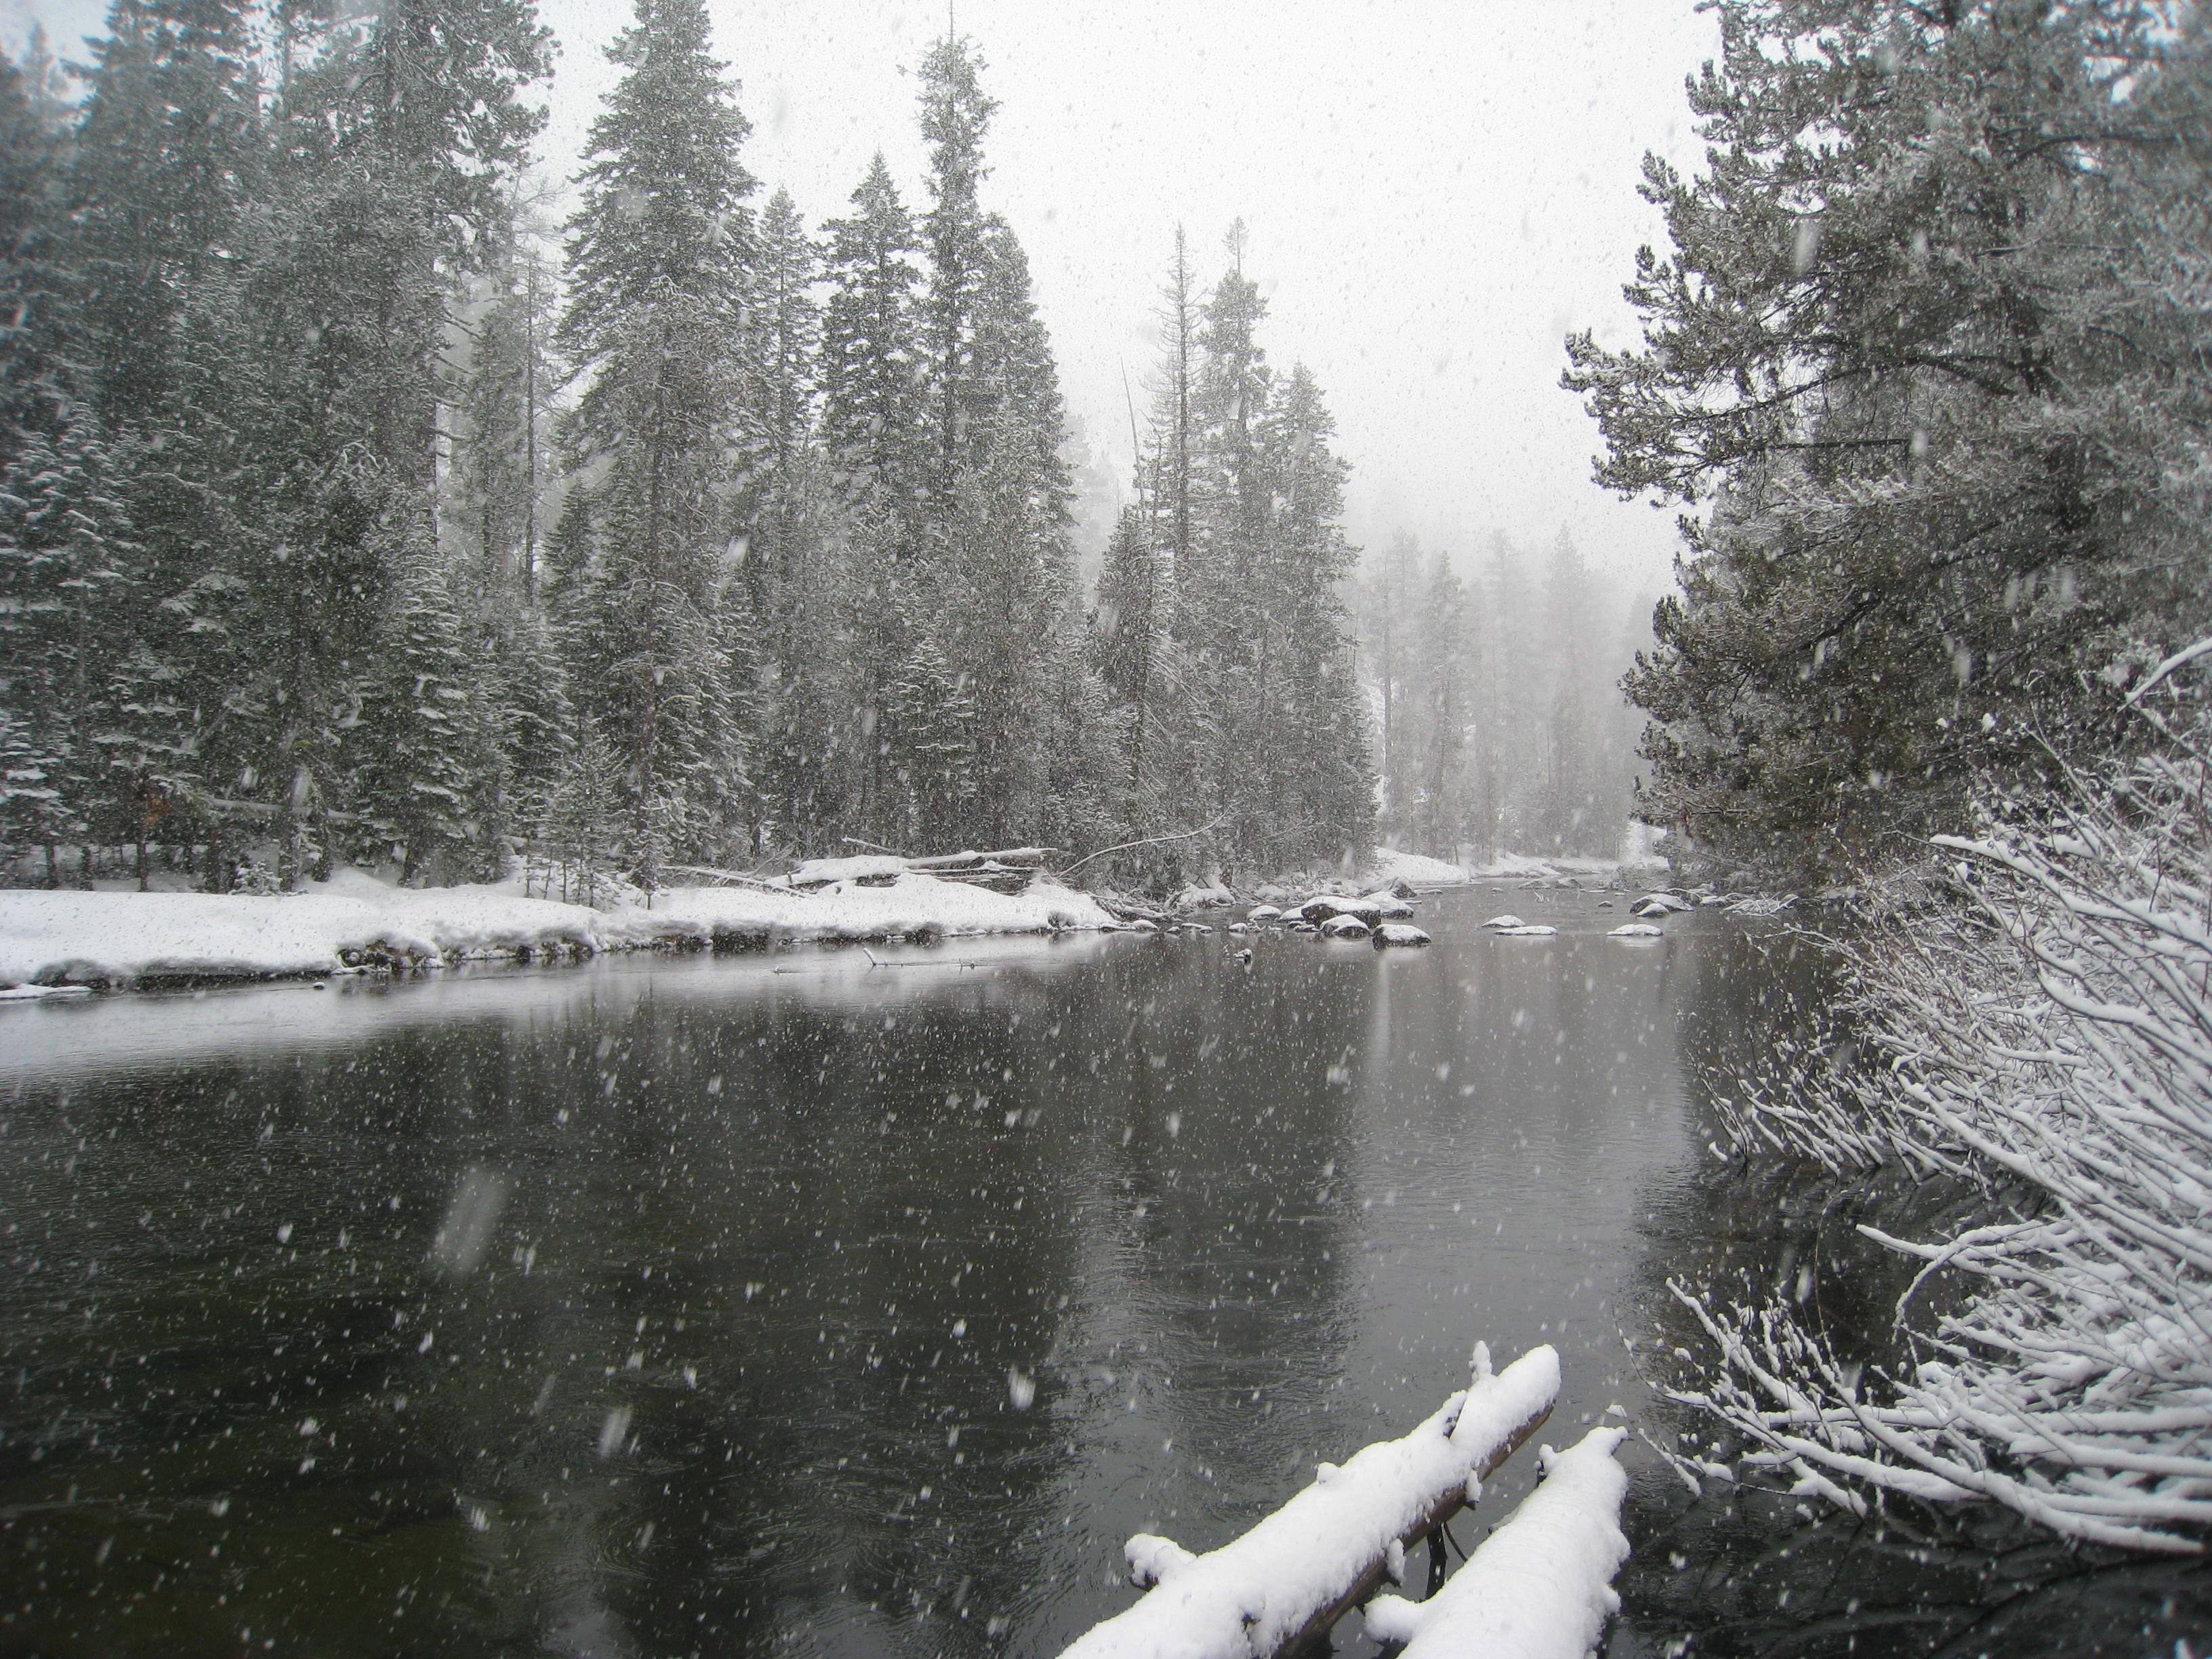 Desktop Wallpaper Falling Snow Winter Wonder Land The Epic Adventures Of Country Kyle